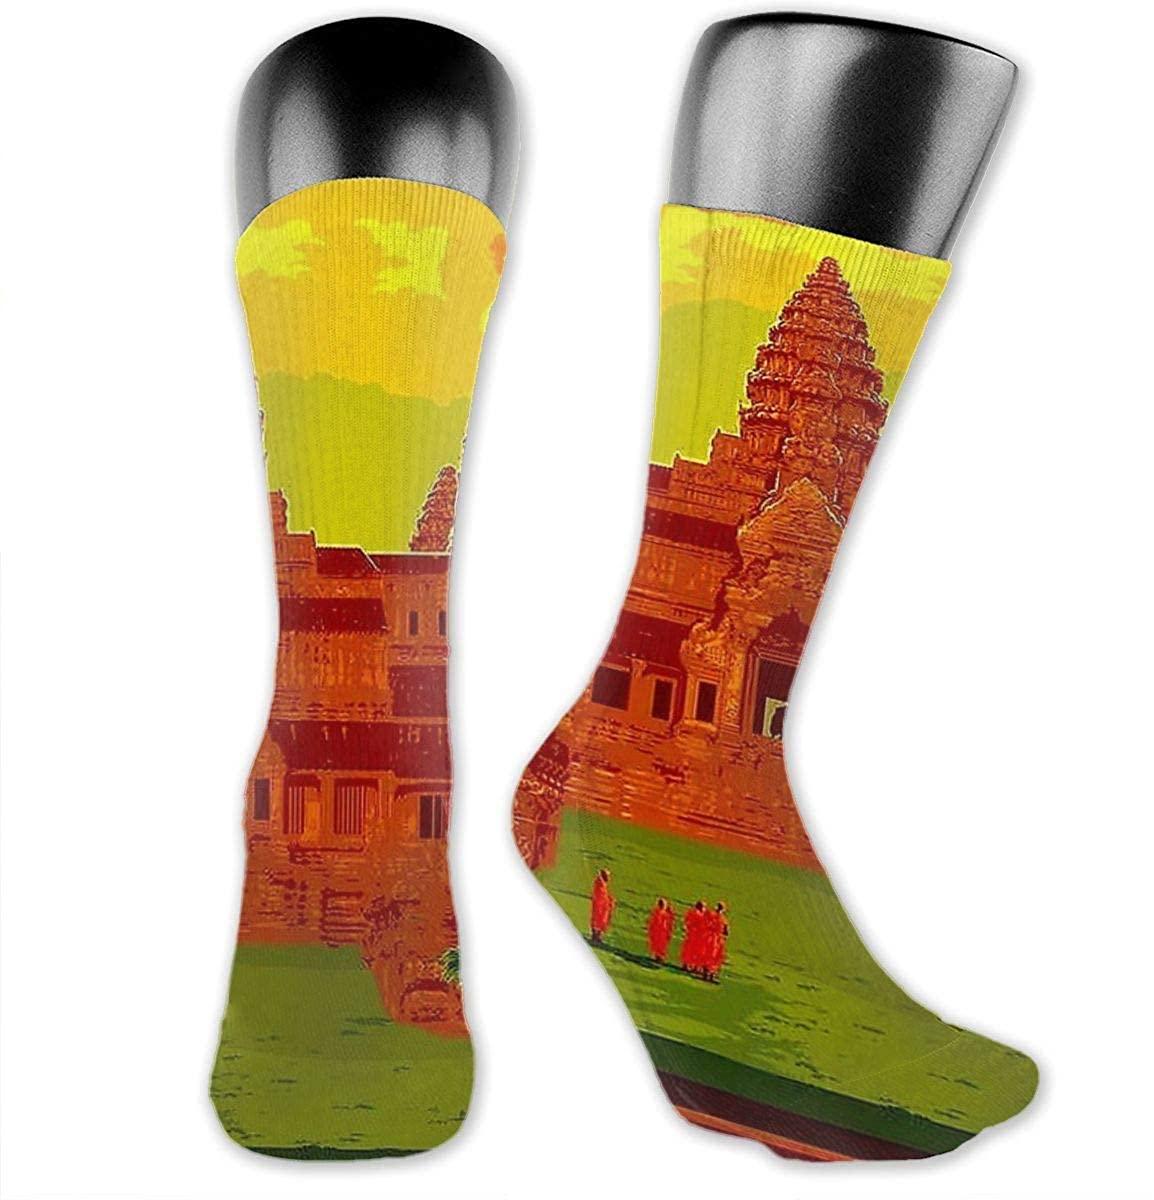 Unisex Crazy Funny Angkor Wat Vintage Cambodia Temple Print Socks Colorful Running Travel Socks Novelty Casual Crew Socks